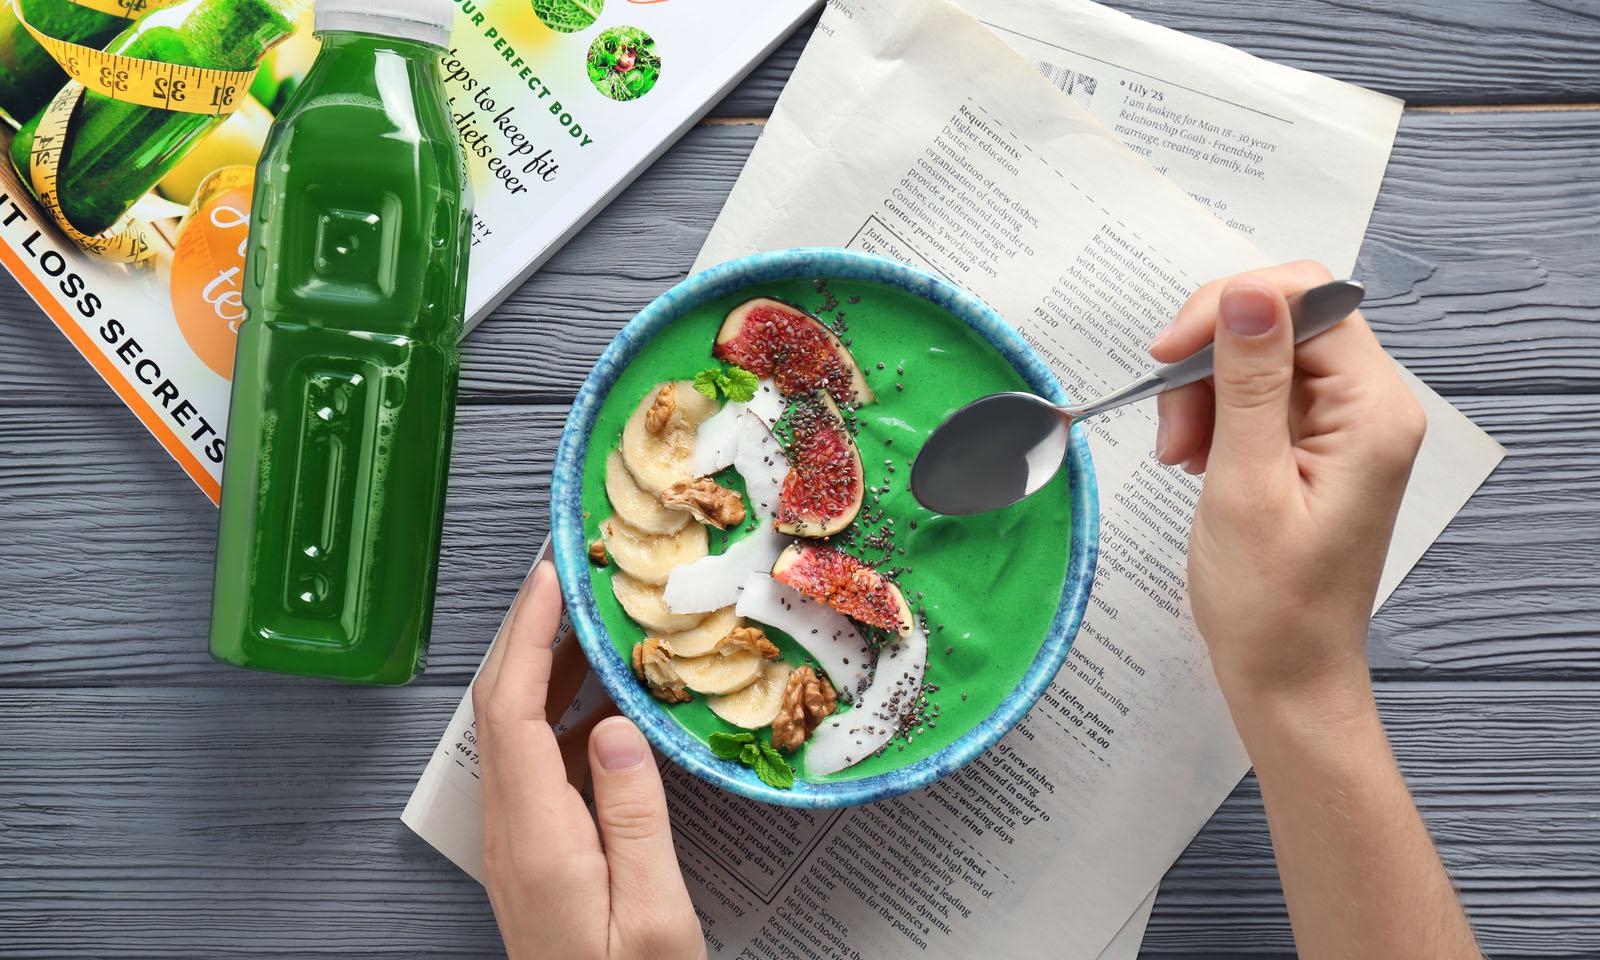 Spirulina A Green Powder with Various Benefits (4)